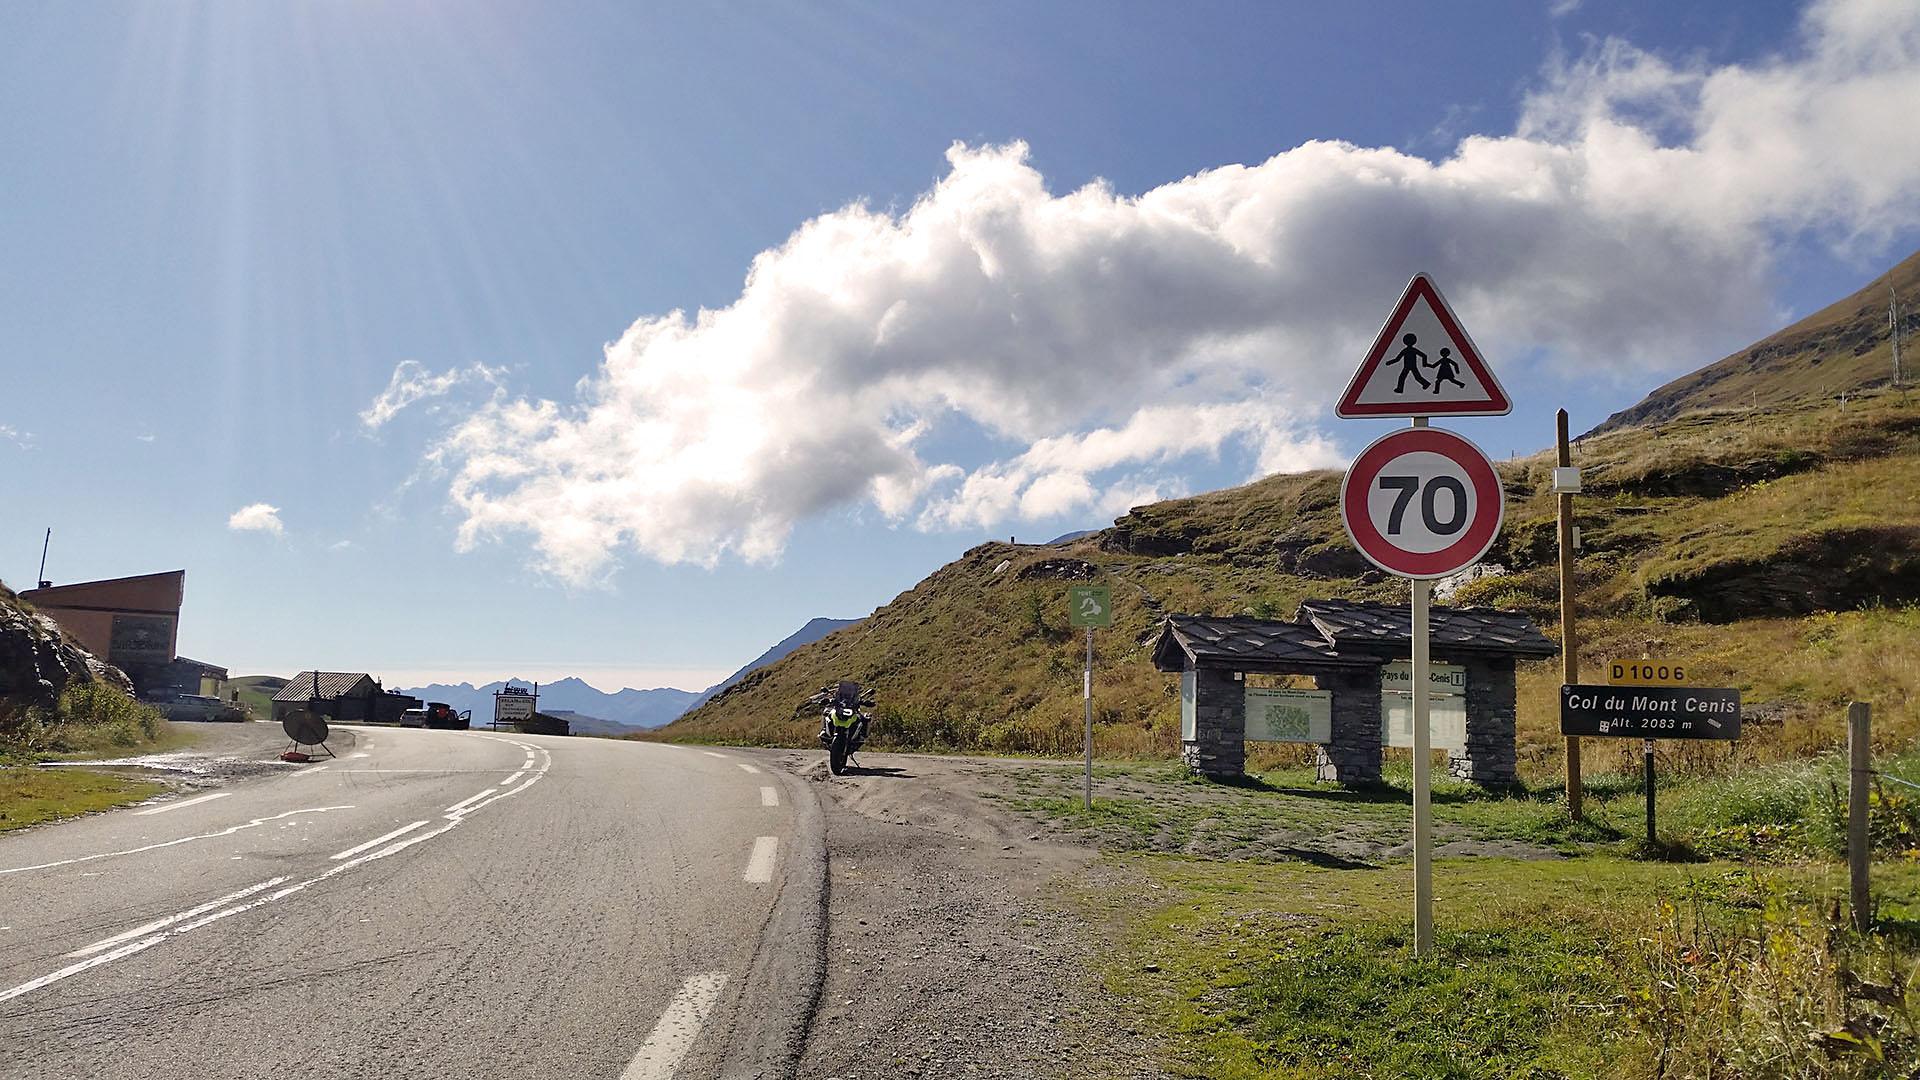 2083 - F - Col du Mont Cenis © Pässe.Info